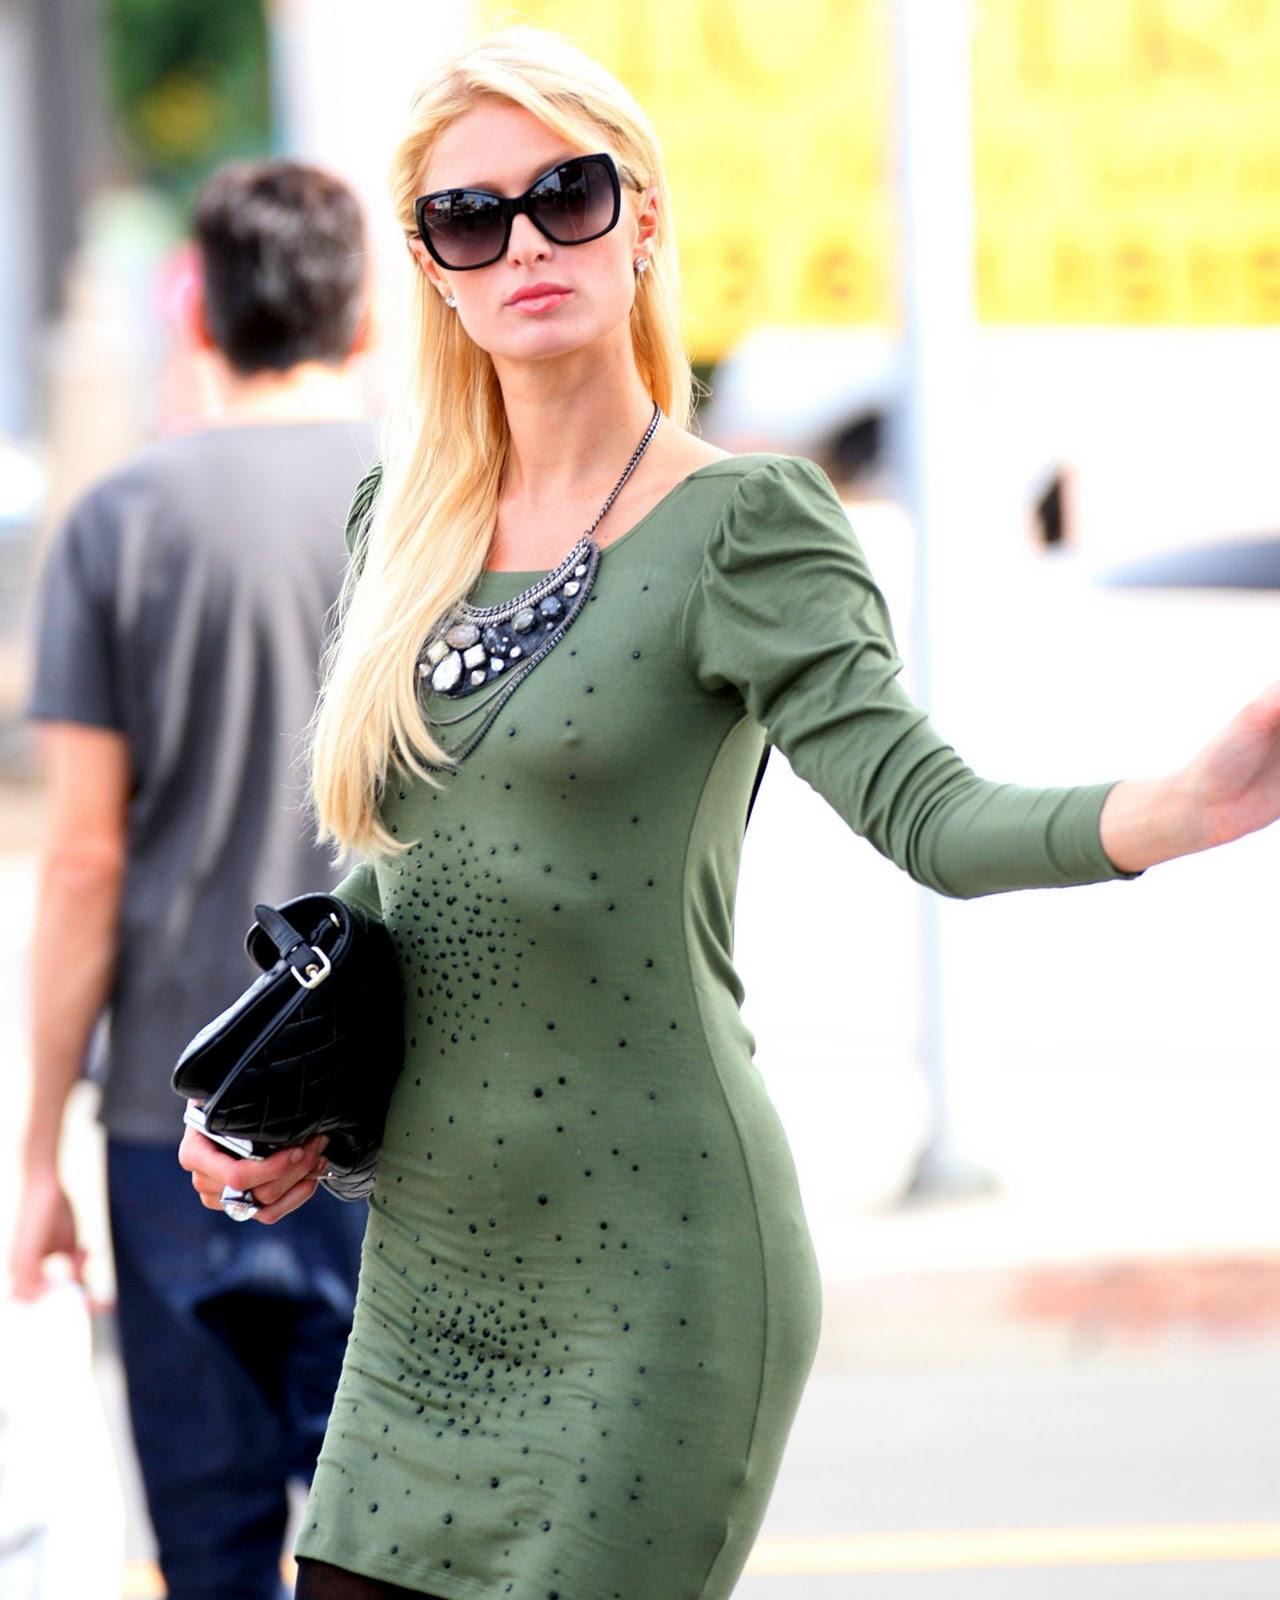 Paris Hilton - Braless Candids in Los Angeles   Hot Celebs